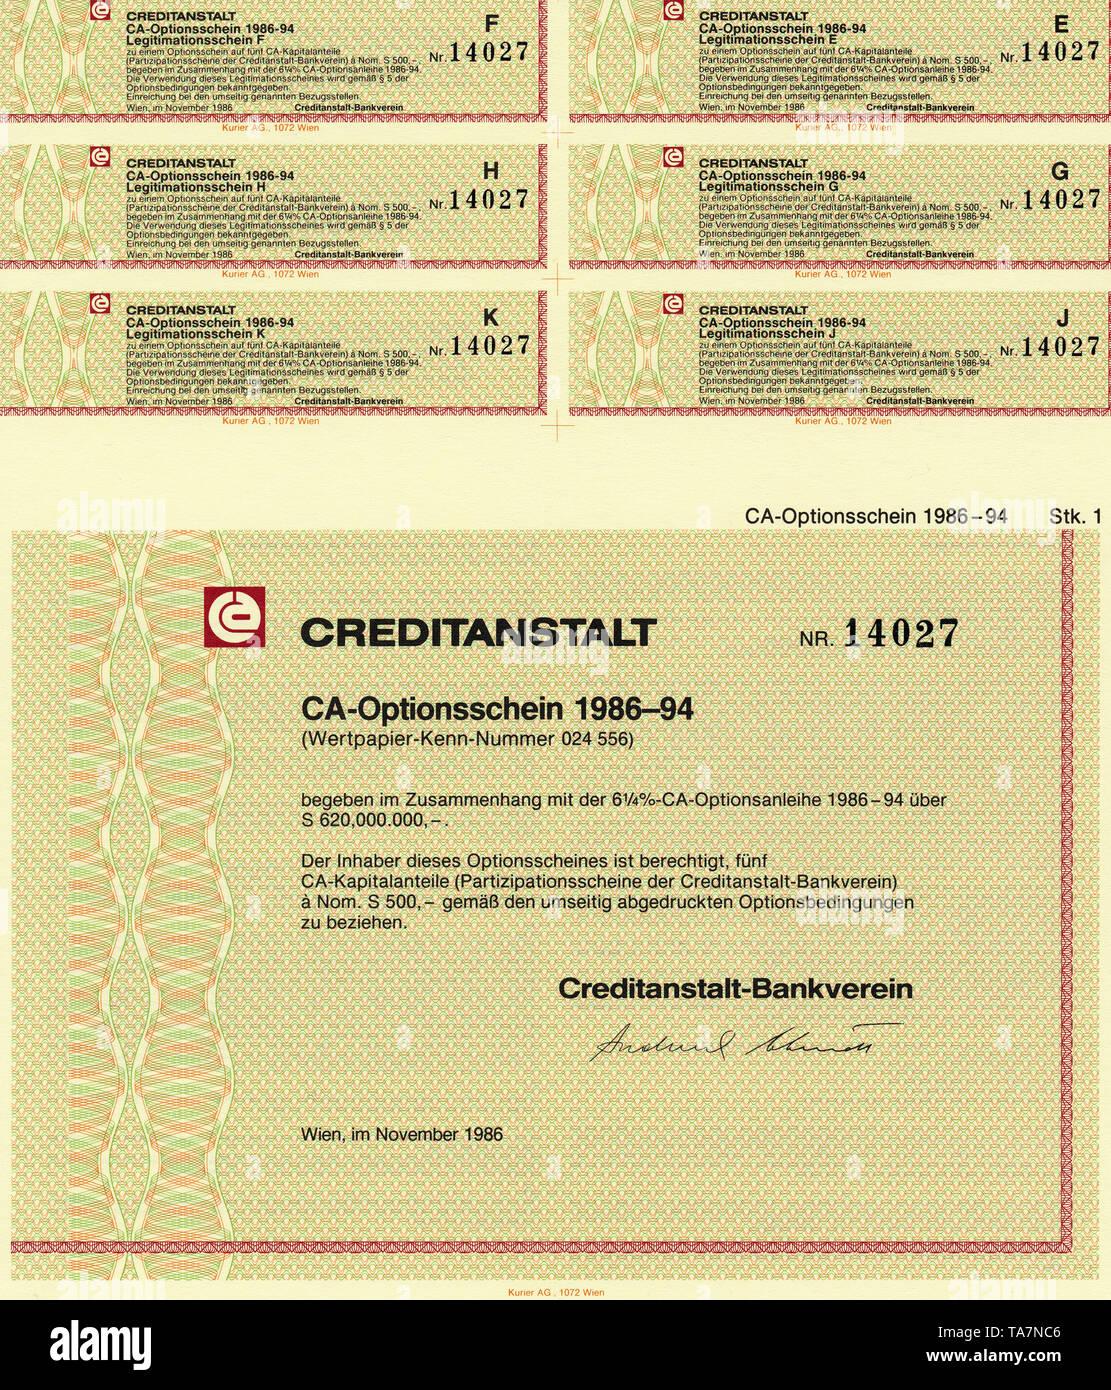 Historic stock certificate, Securities certificate, bearer warrant, Wertpapier, Inhaber-Optionsschein, Österreichische Schilling, Creditanstalt Wien, Creditanstalt-Bankverein, CA, Wien, 1986, Österreich, Europa - Stock Image